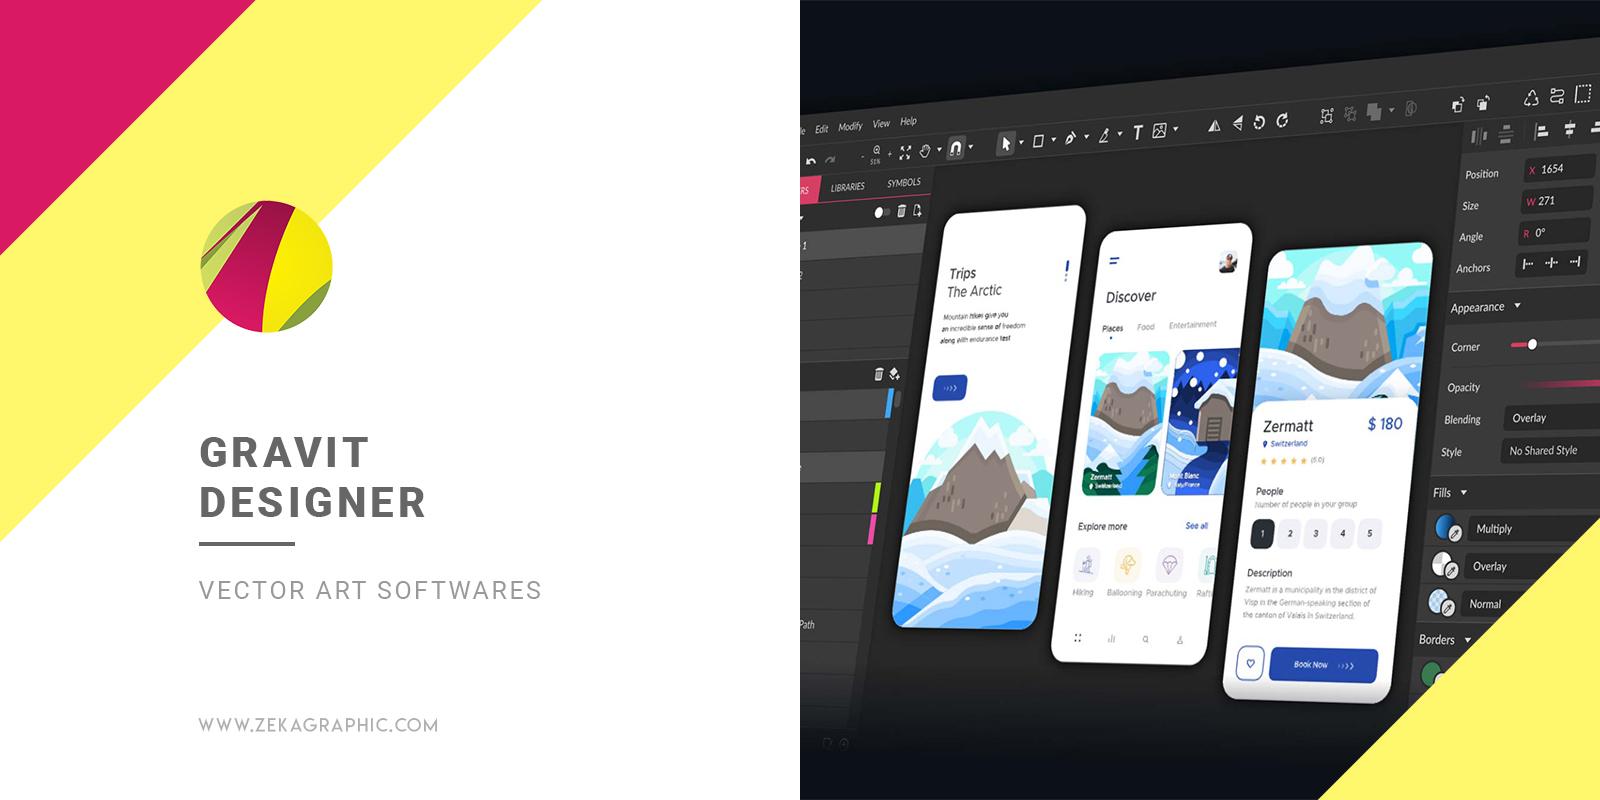 Gravit Designer Graphic Design Software For Vector Art